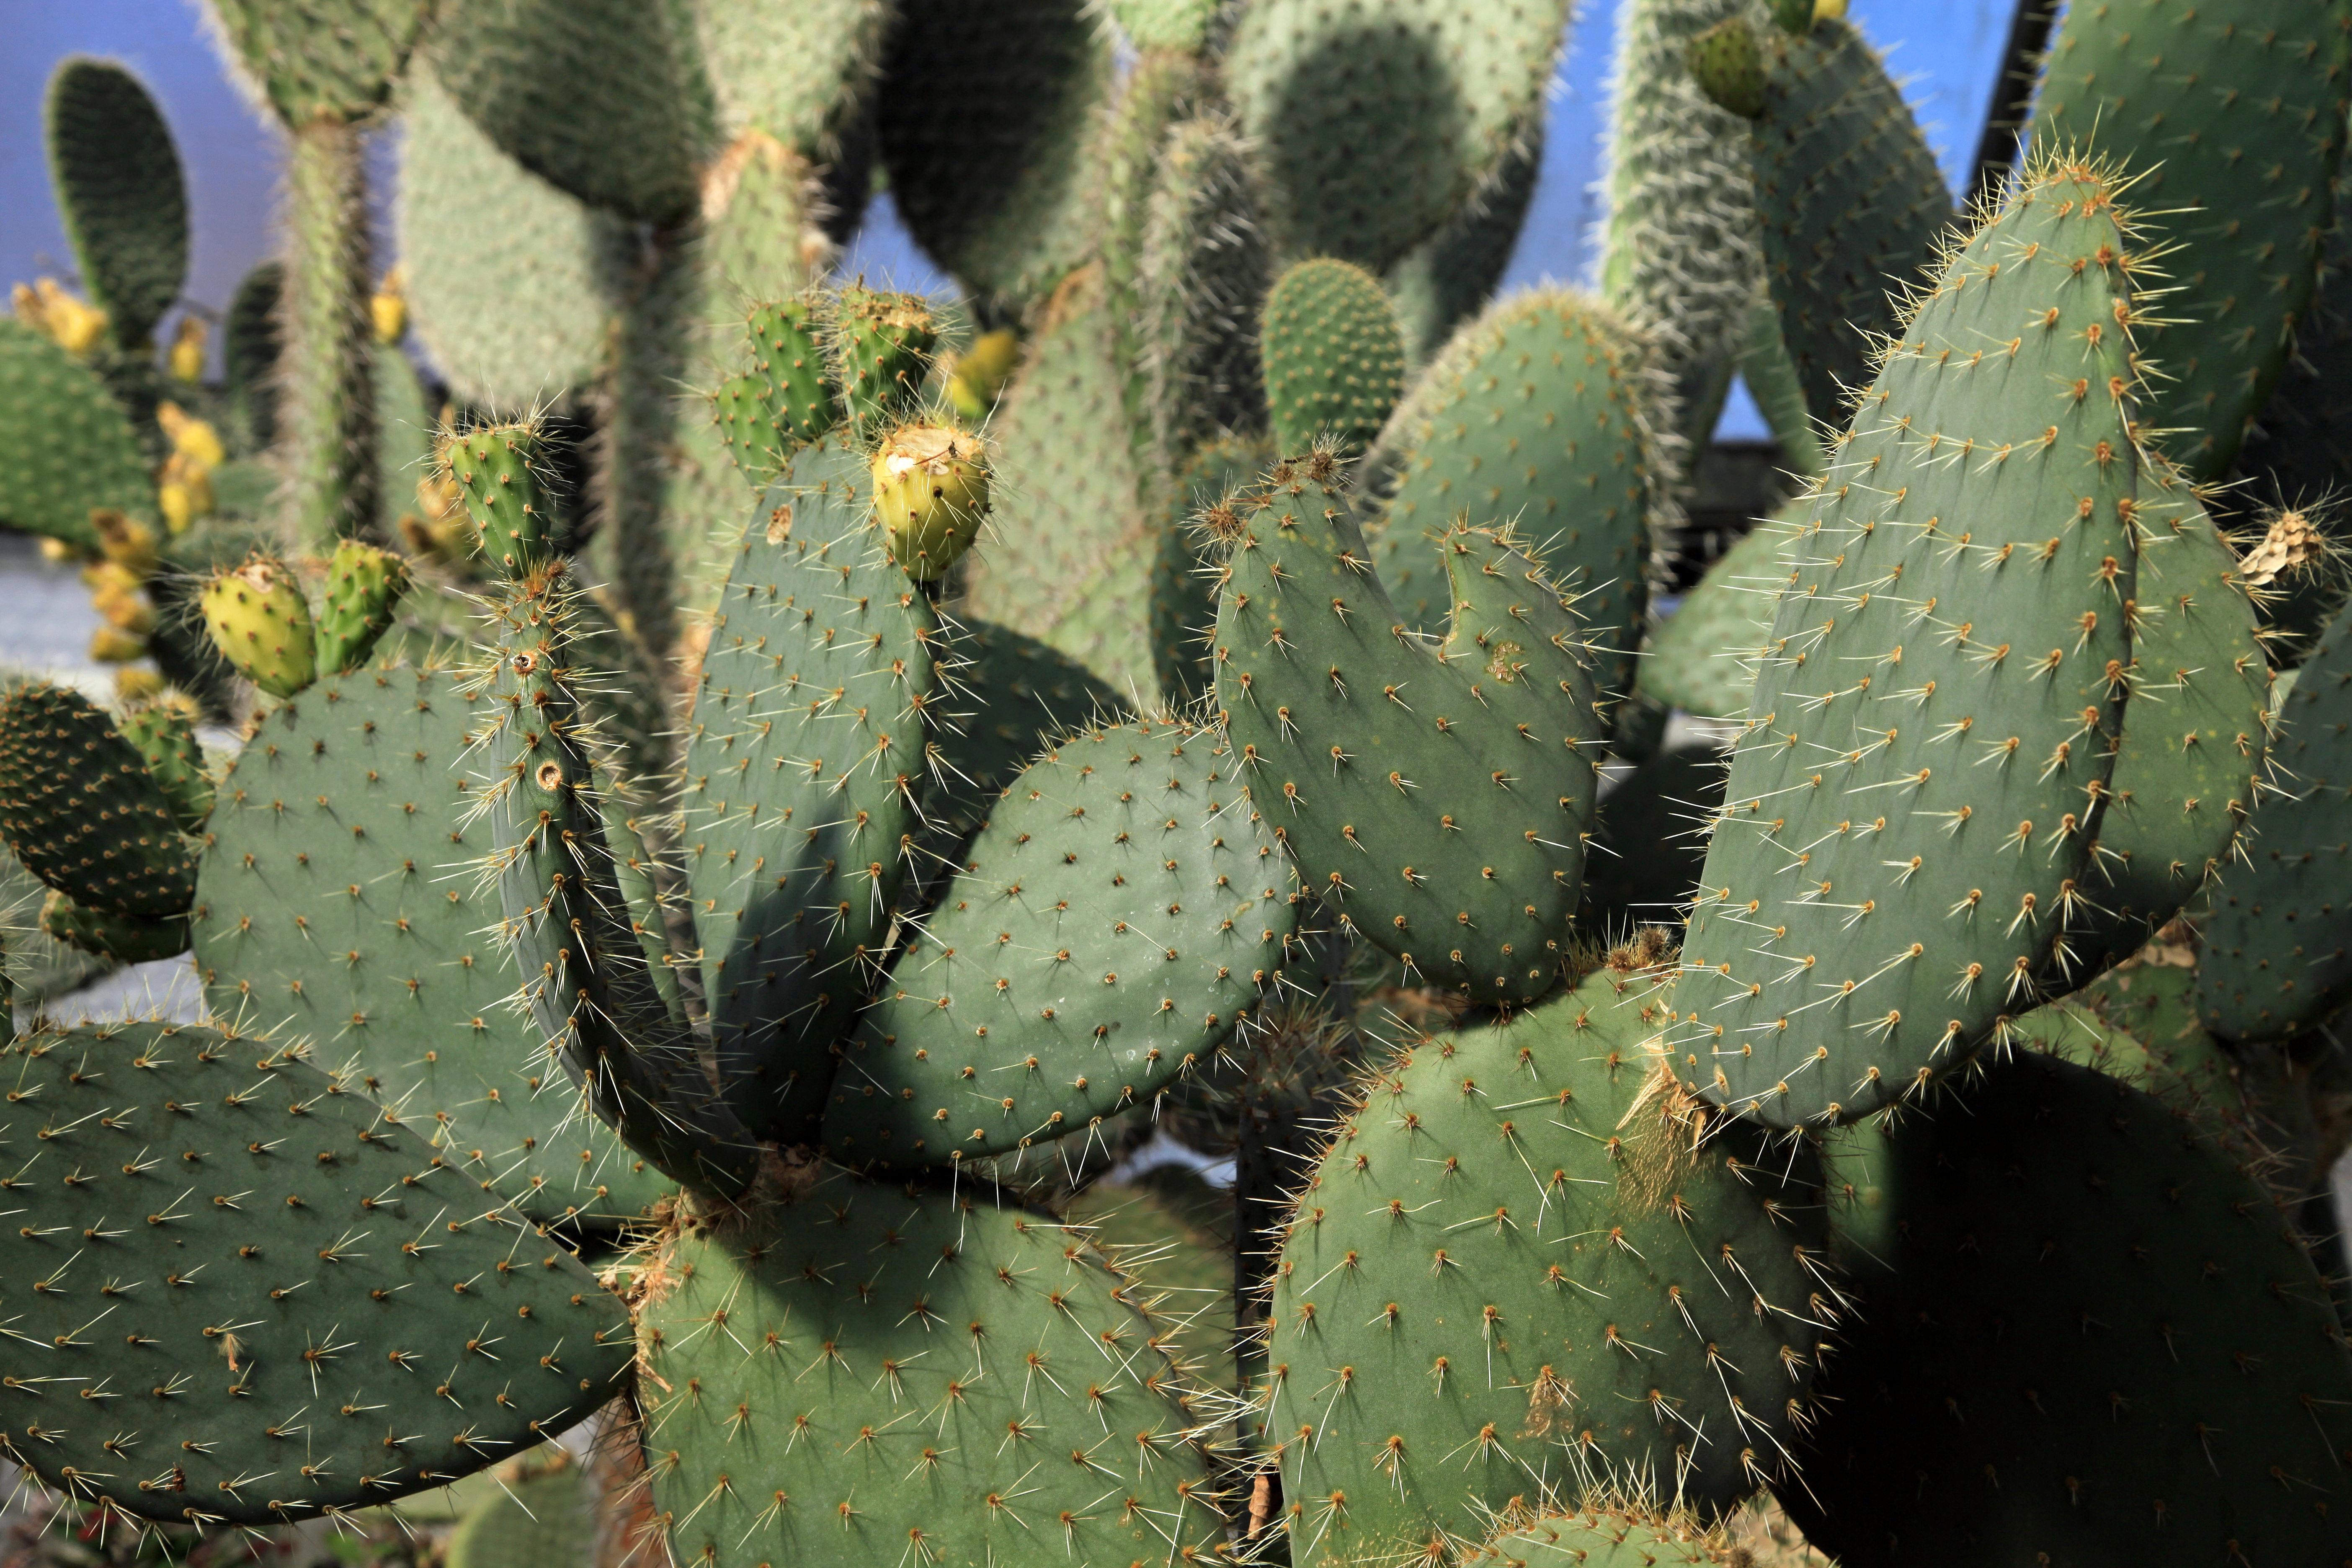 kostenlose foto kaktus gr n produzieren botanik. Black Bedroom Furniture Sets. Home Design Ideas